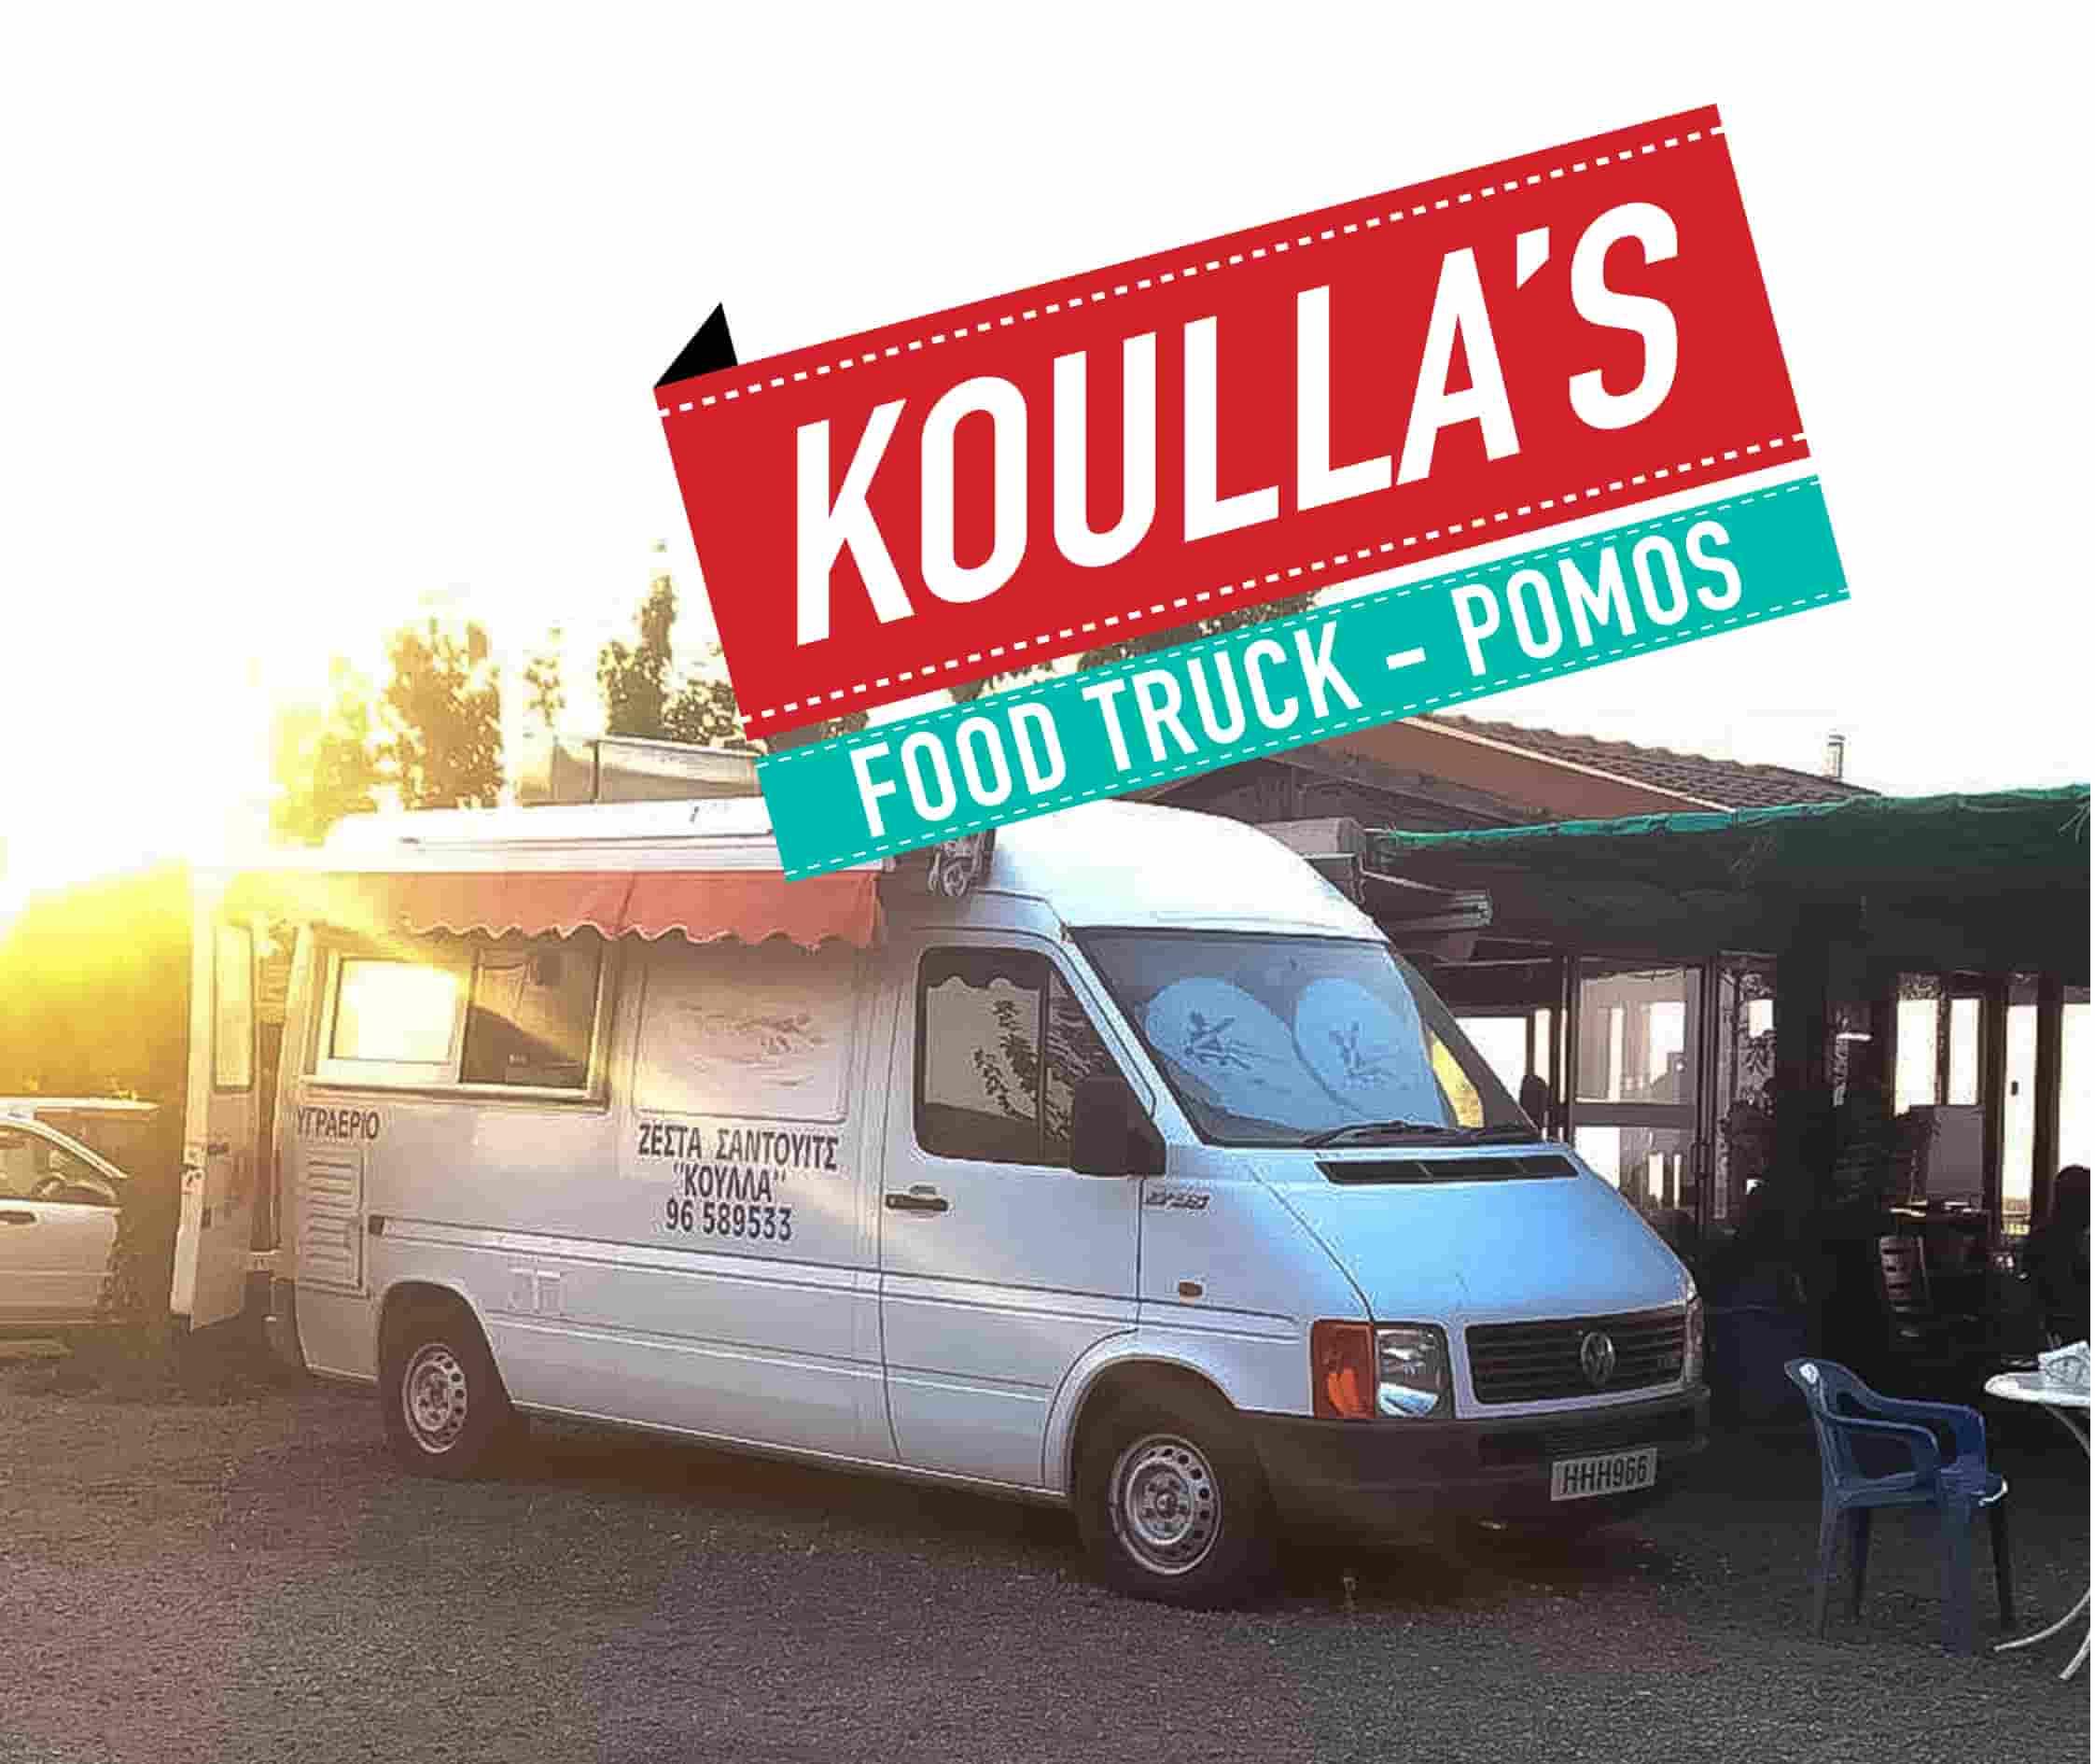 Koullas-sandwiches-food-truck-pomos-vegan-cyprus13